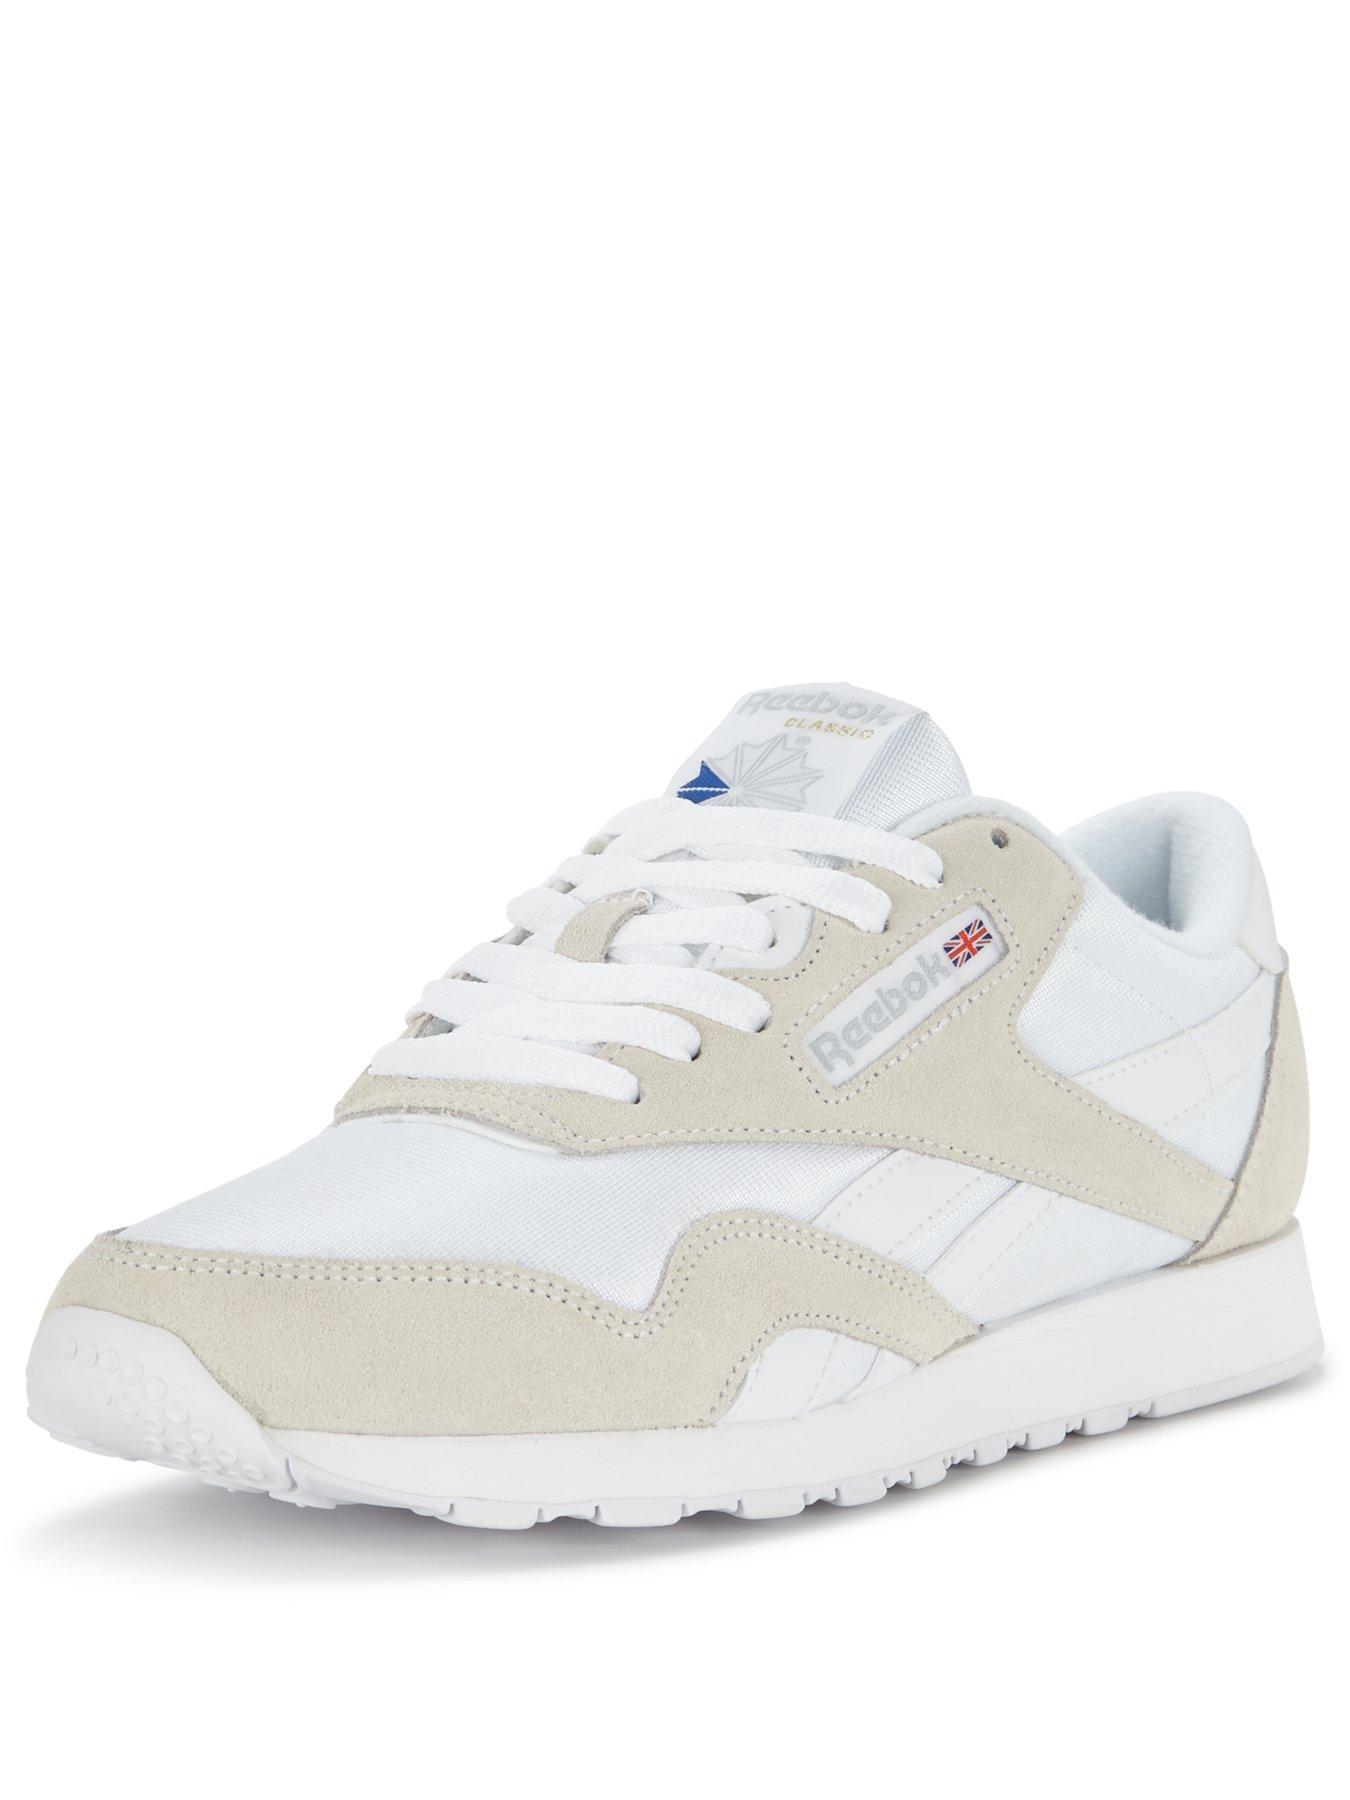 reebok classic nylon mens trainers